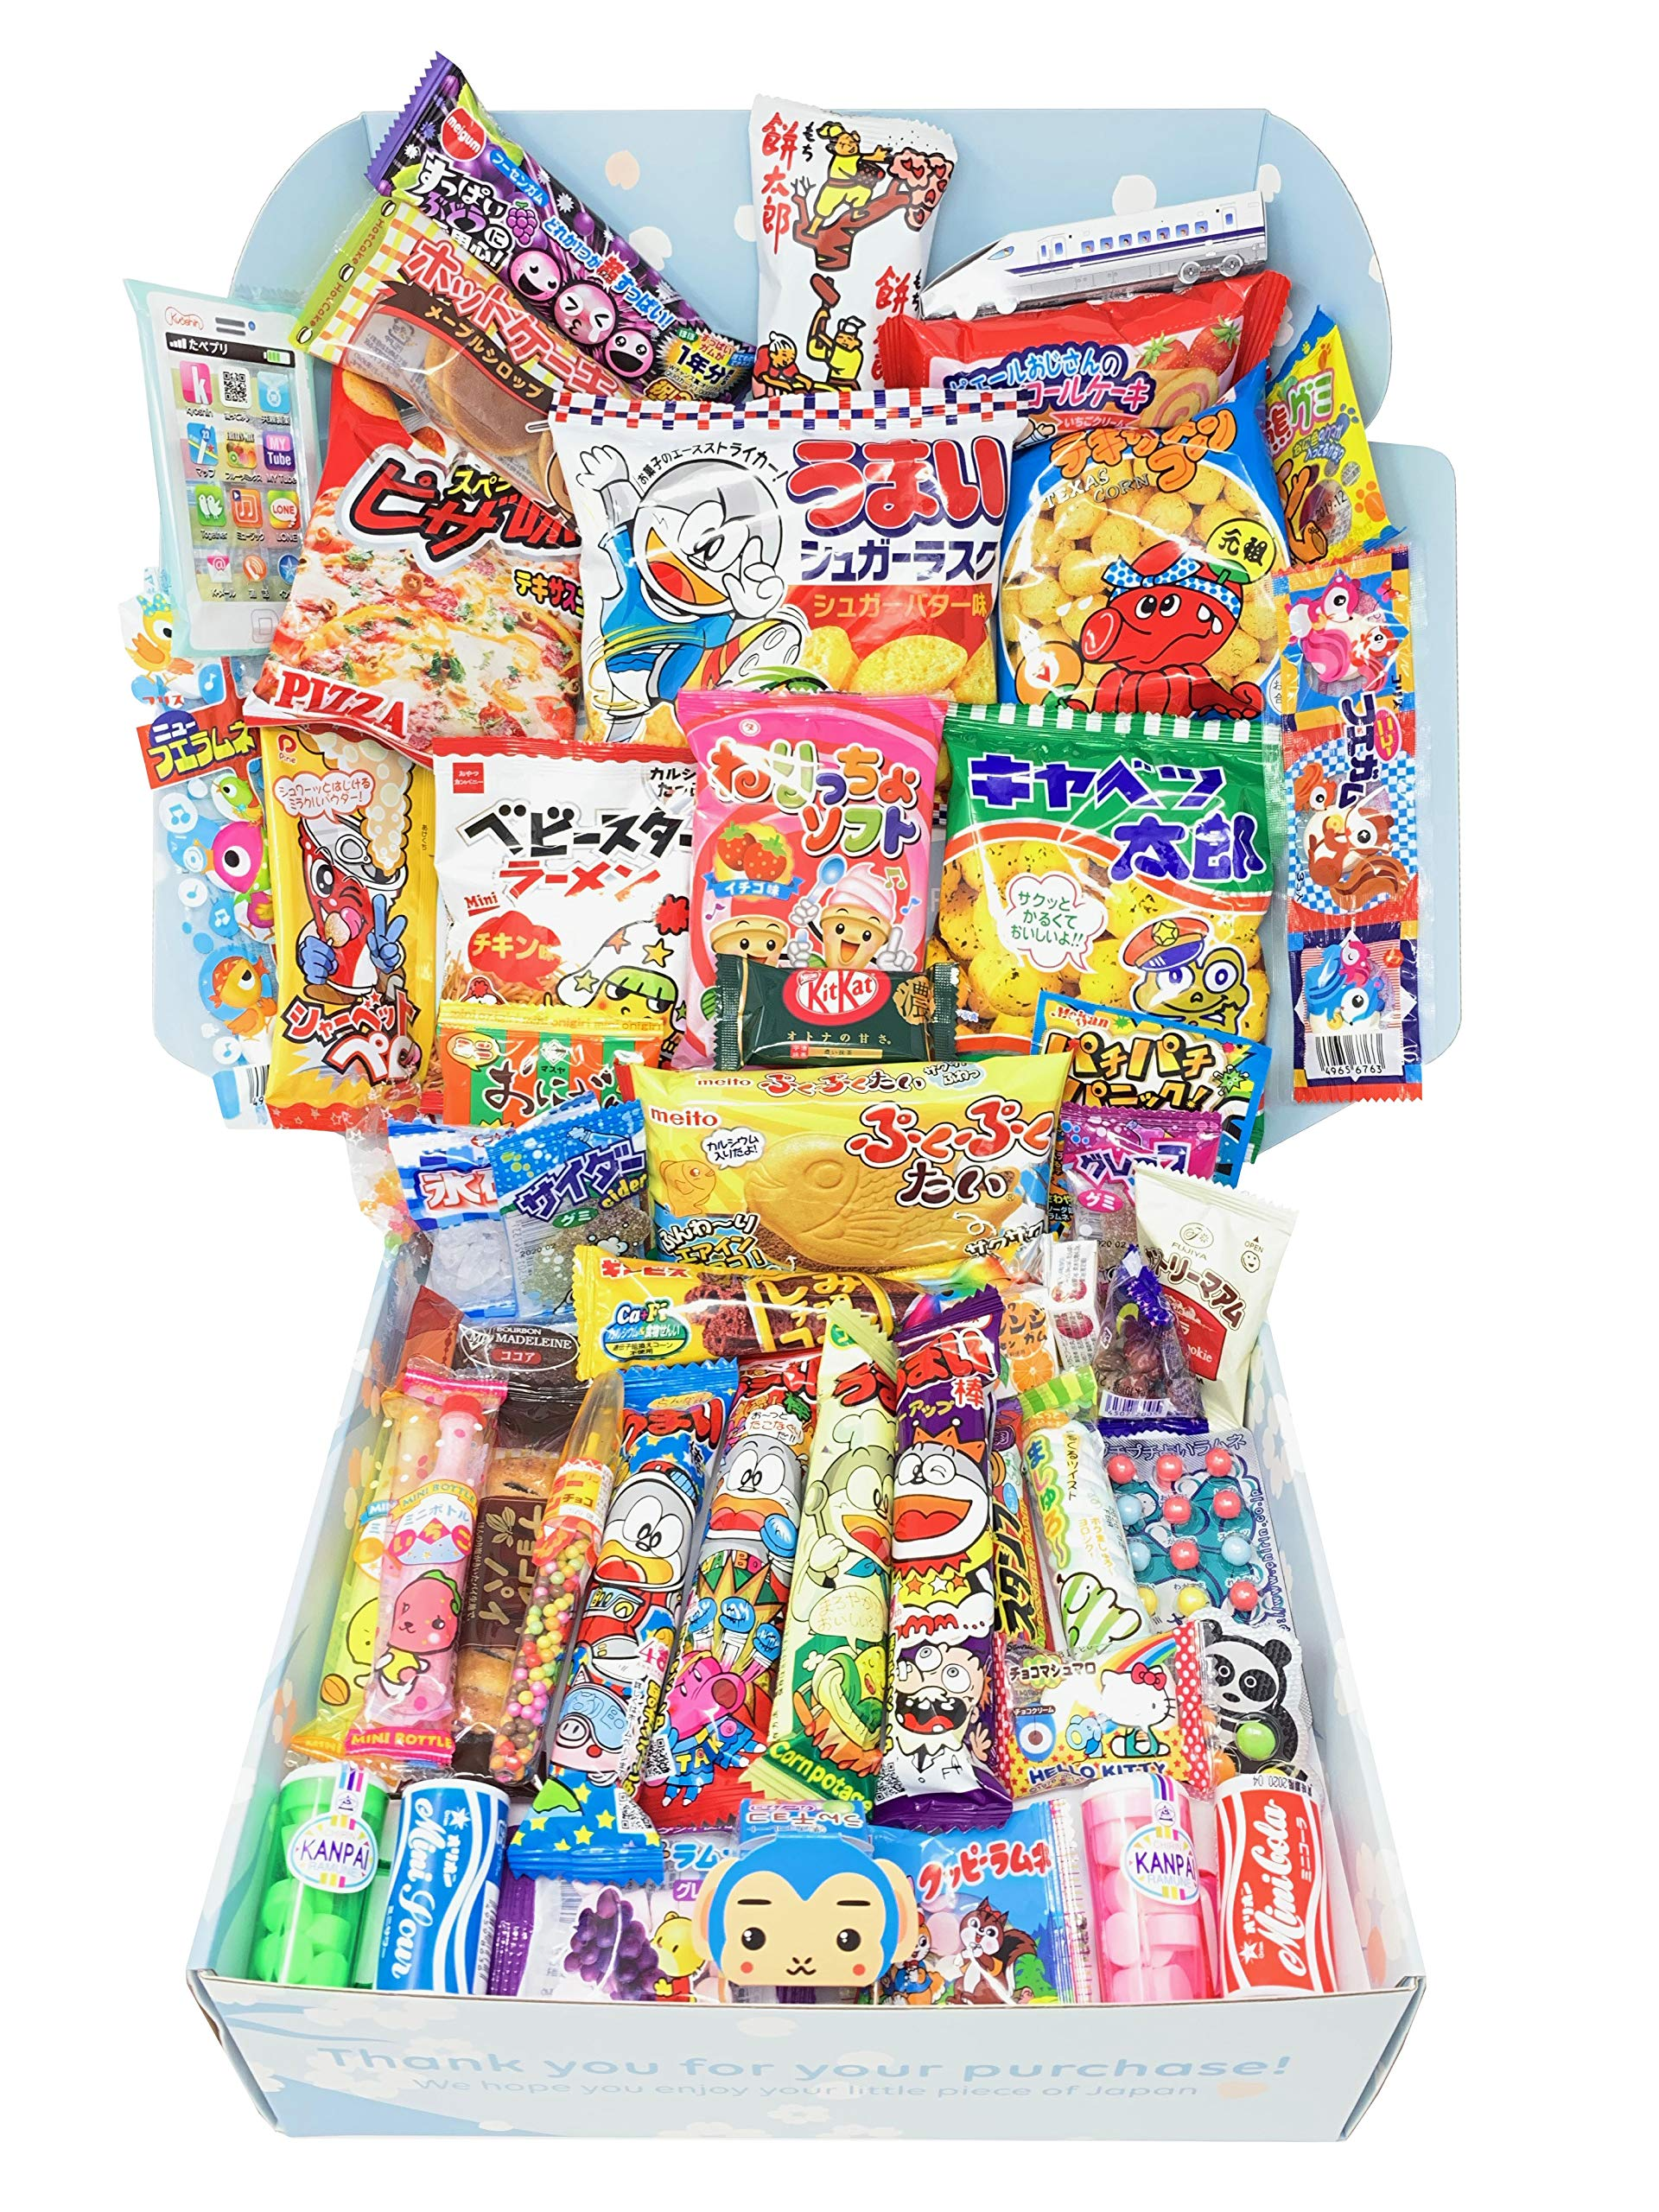 Sakura Box - Dagashi Set - Large 50 Pieces Japanese Candy Chocolate Snacks (Large) by Sakura Box